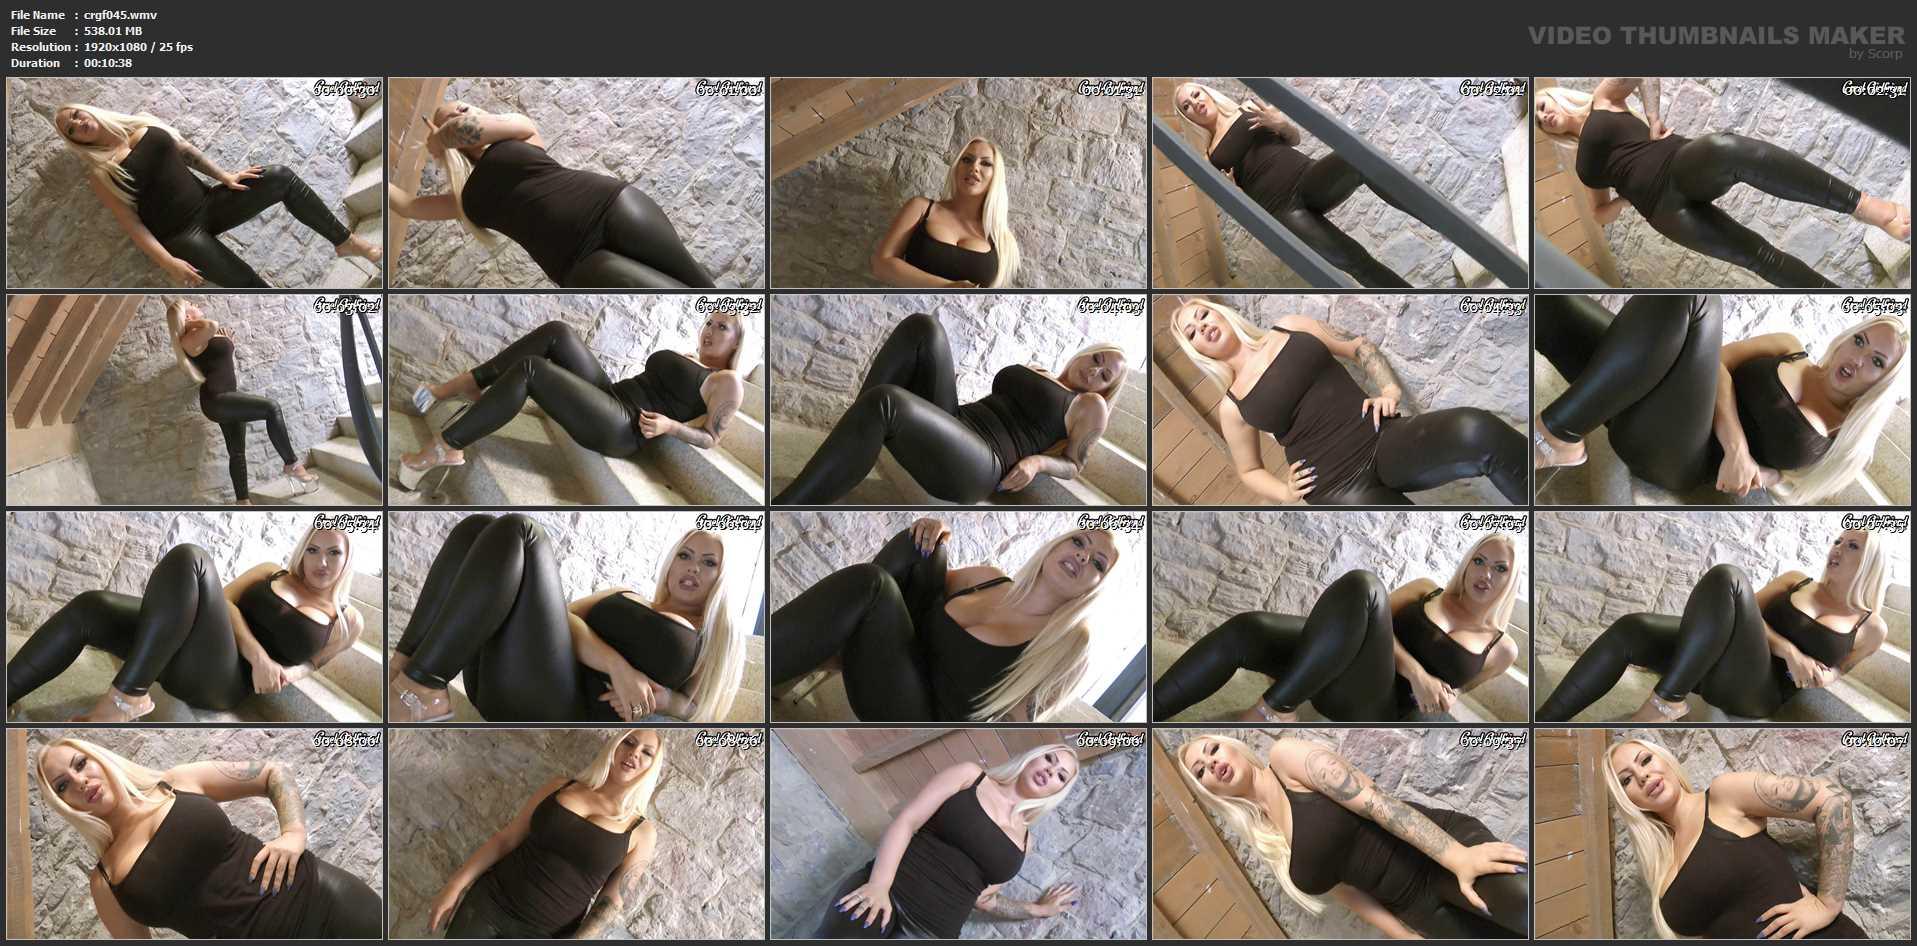 Jessie Jensen In Scene: Pimped For Your Implants - CRUELGF - FULL HD/1080p/WMV